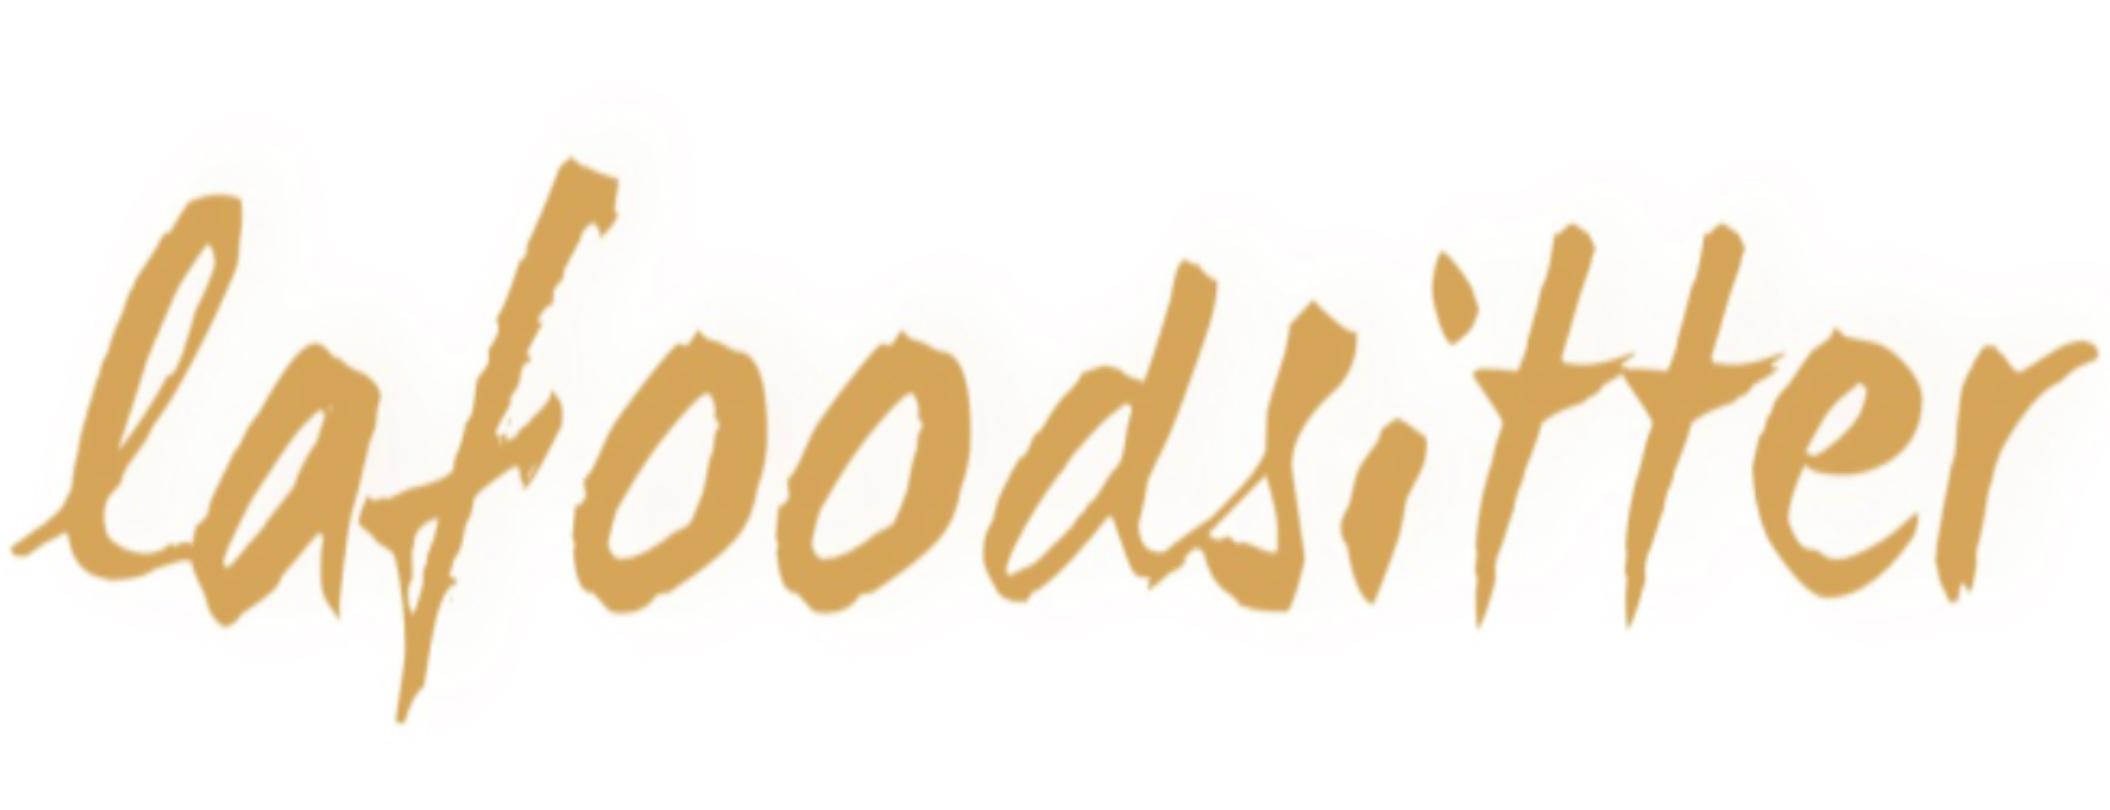 lafoodsitter Foodcast